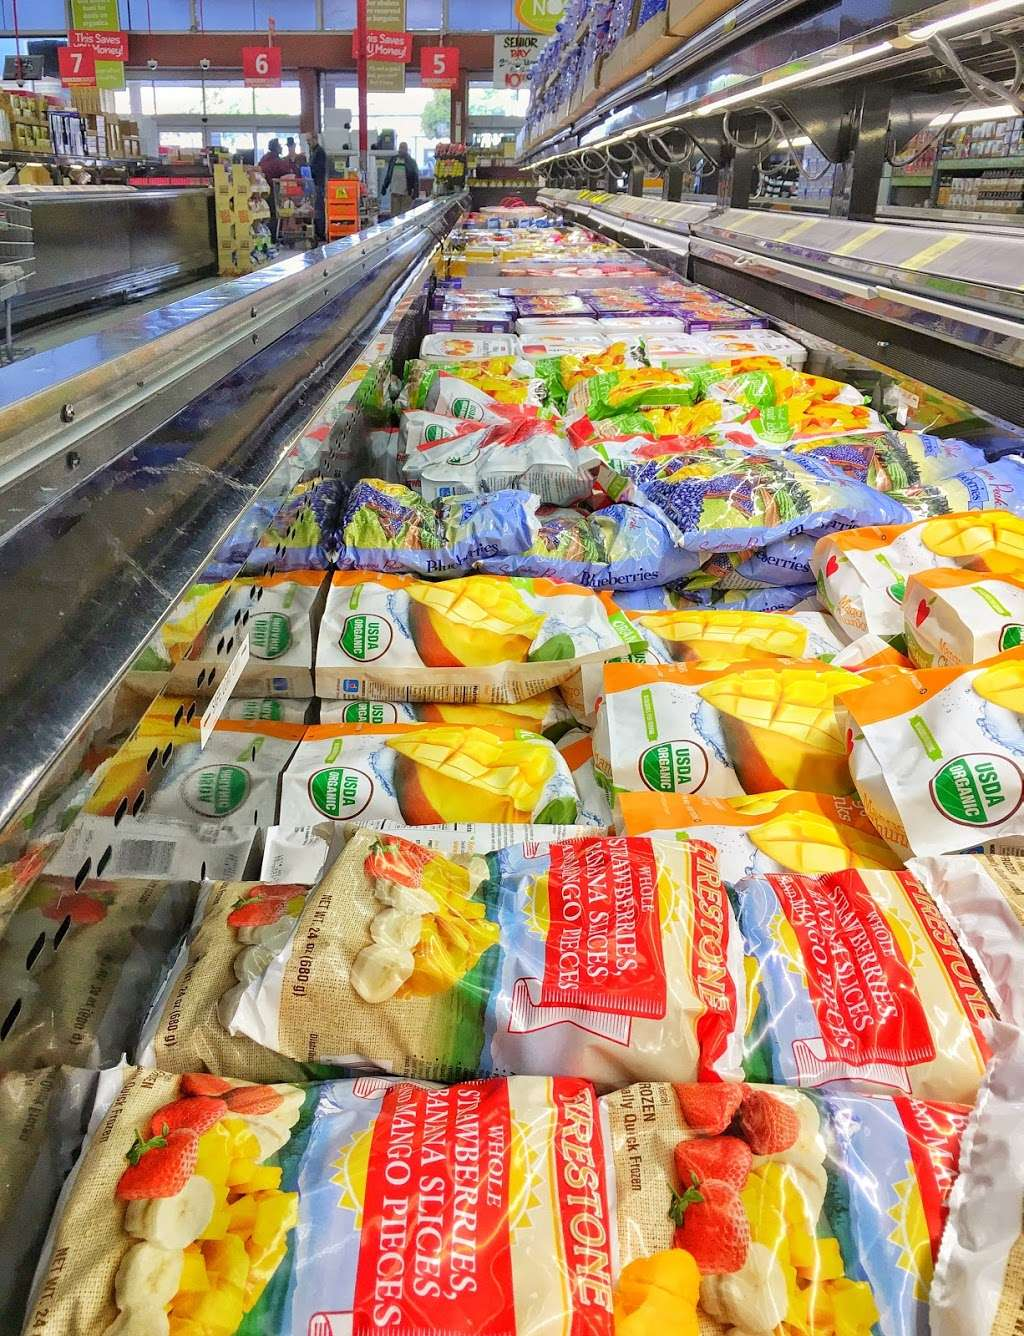 Grocery Outlet Bargain Market - supermarket    Photo 5 of 10   Address: 2900 Broadway, Oakland, CA 94611, USA   Phone: (510) 465-5649